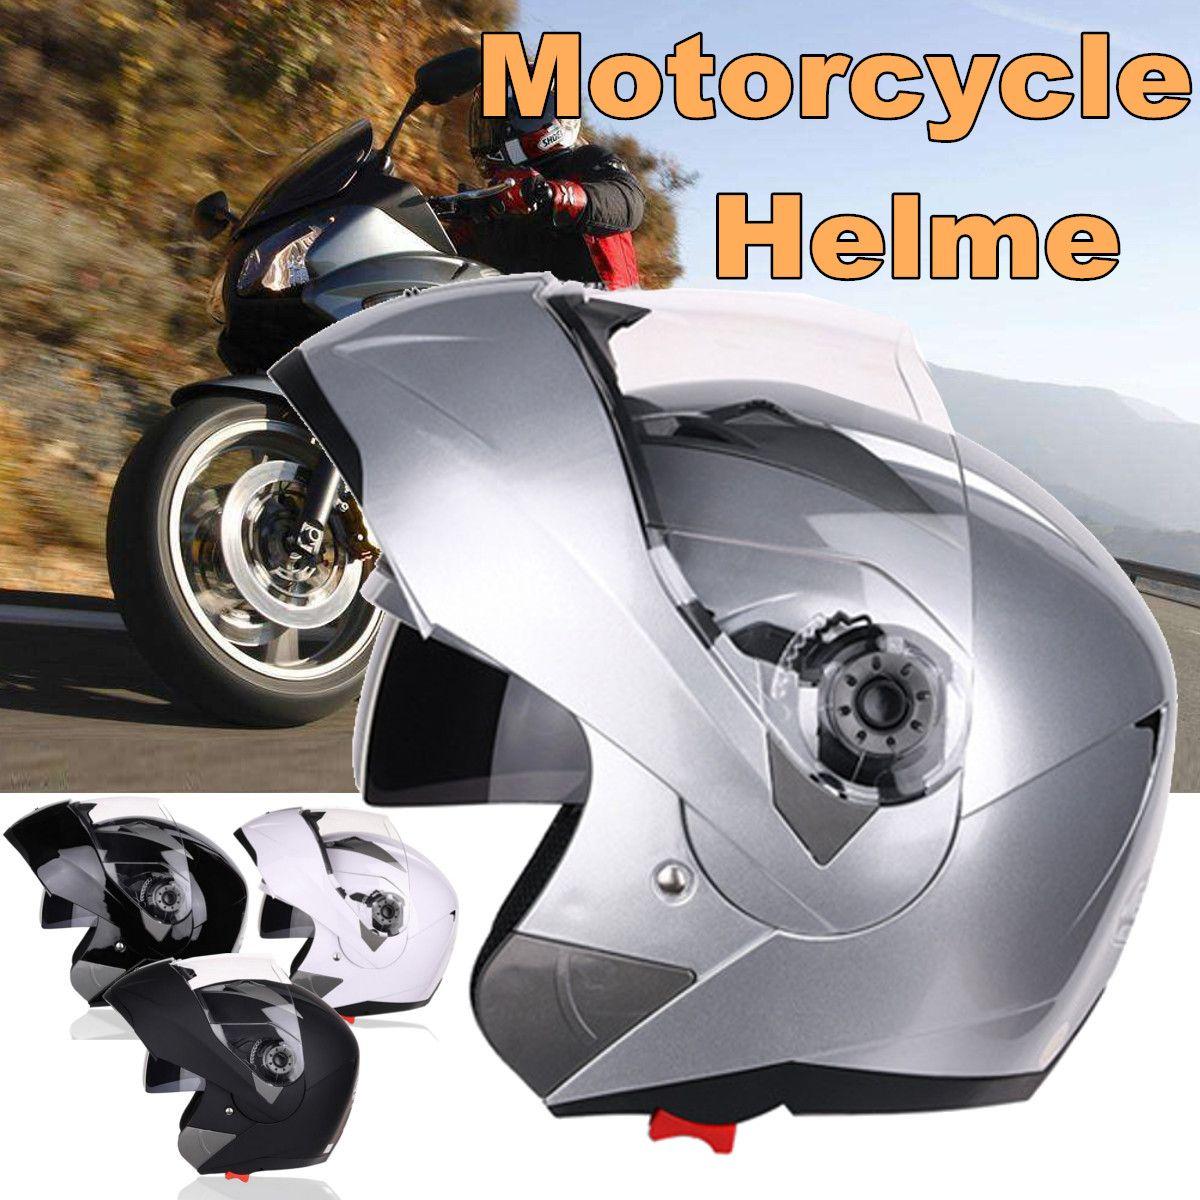 Full Face Helmet Modular Flip Up Front Motorcycle Motorbike Helmet Sun Visor Protective Gears 4 Colors